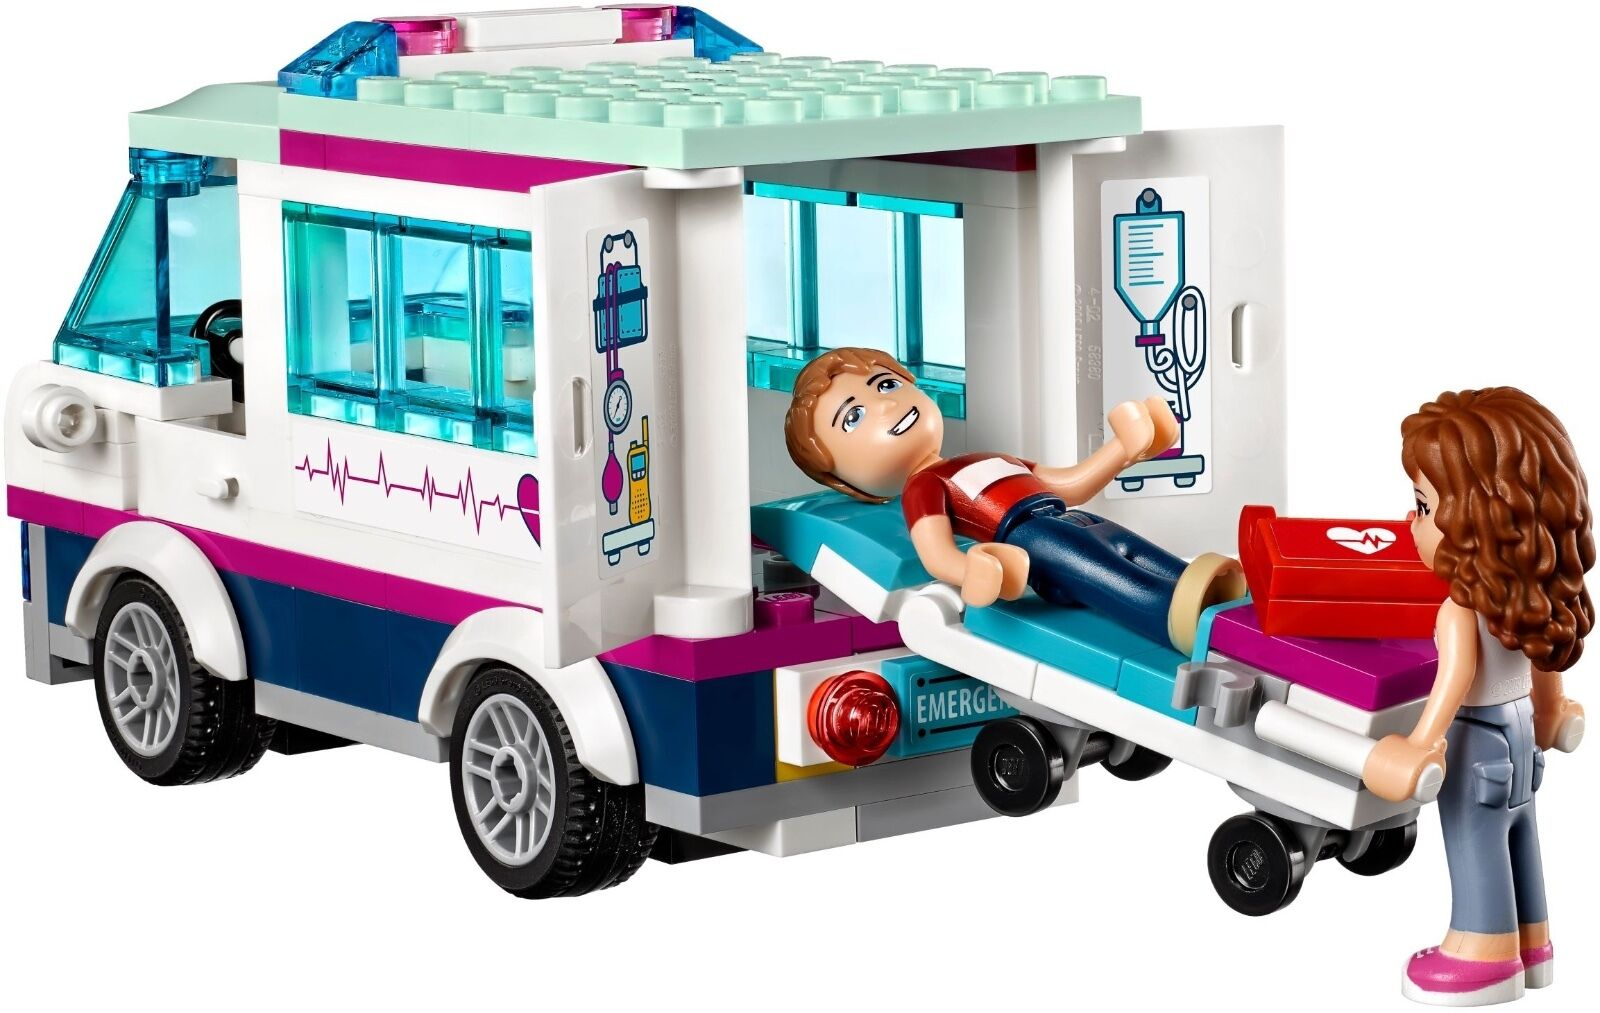 LEGO ® Friends Friends Friends 41318 Heartlake hôpital Nouveau neuf dans sa boîte _ Heartlake Hospital new Boîte d'origine jamais ouverte a96cbe